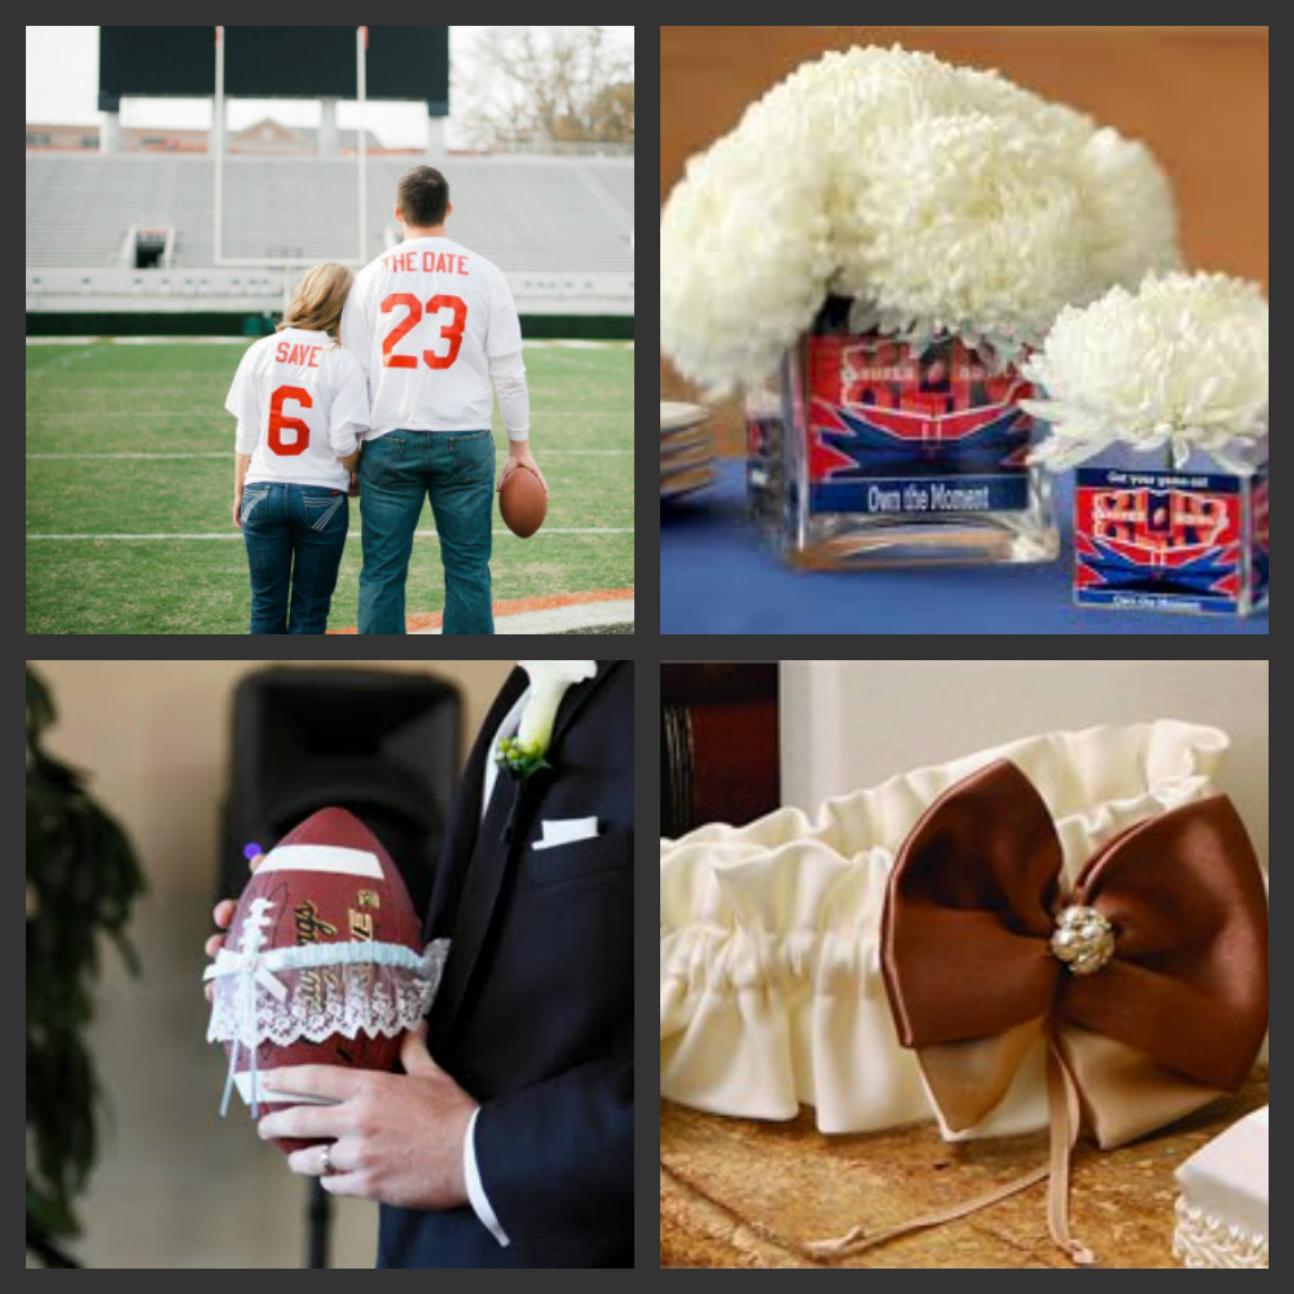 Soccer Themed Wedding Ideas: Weddings Are Fun Blog: Football Themed Wedding